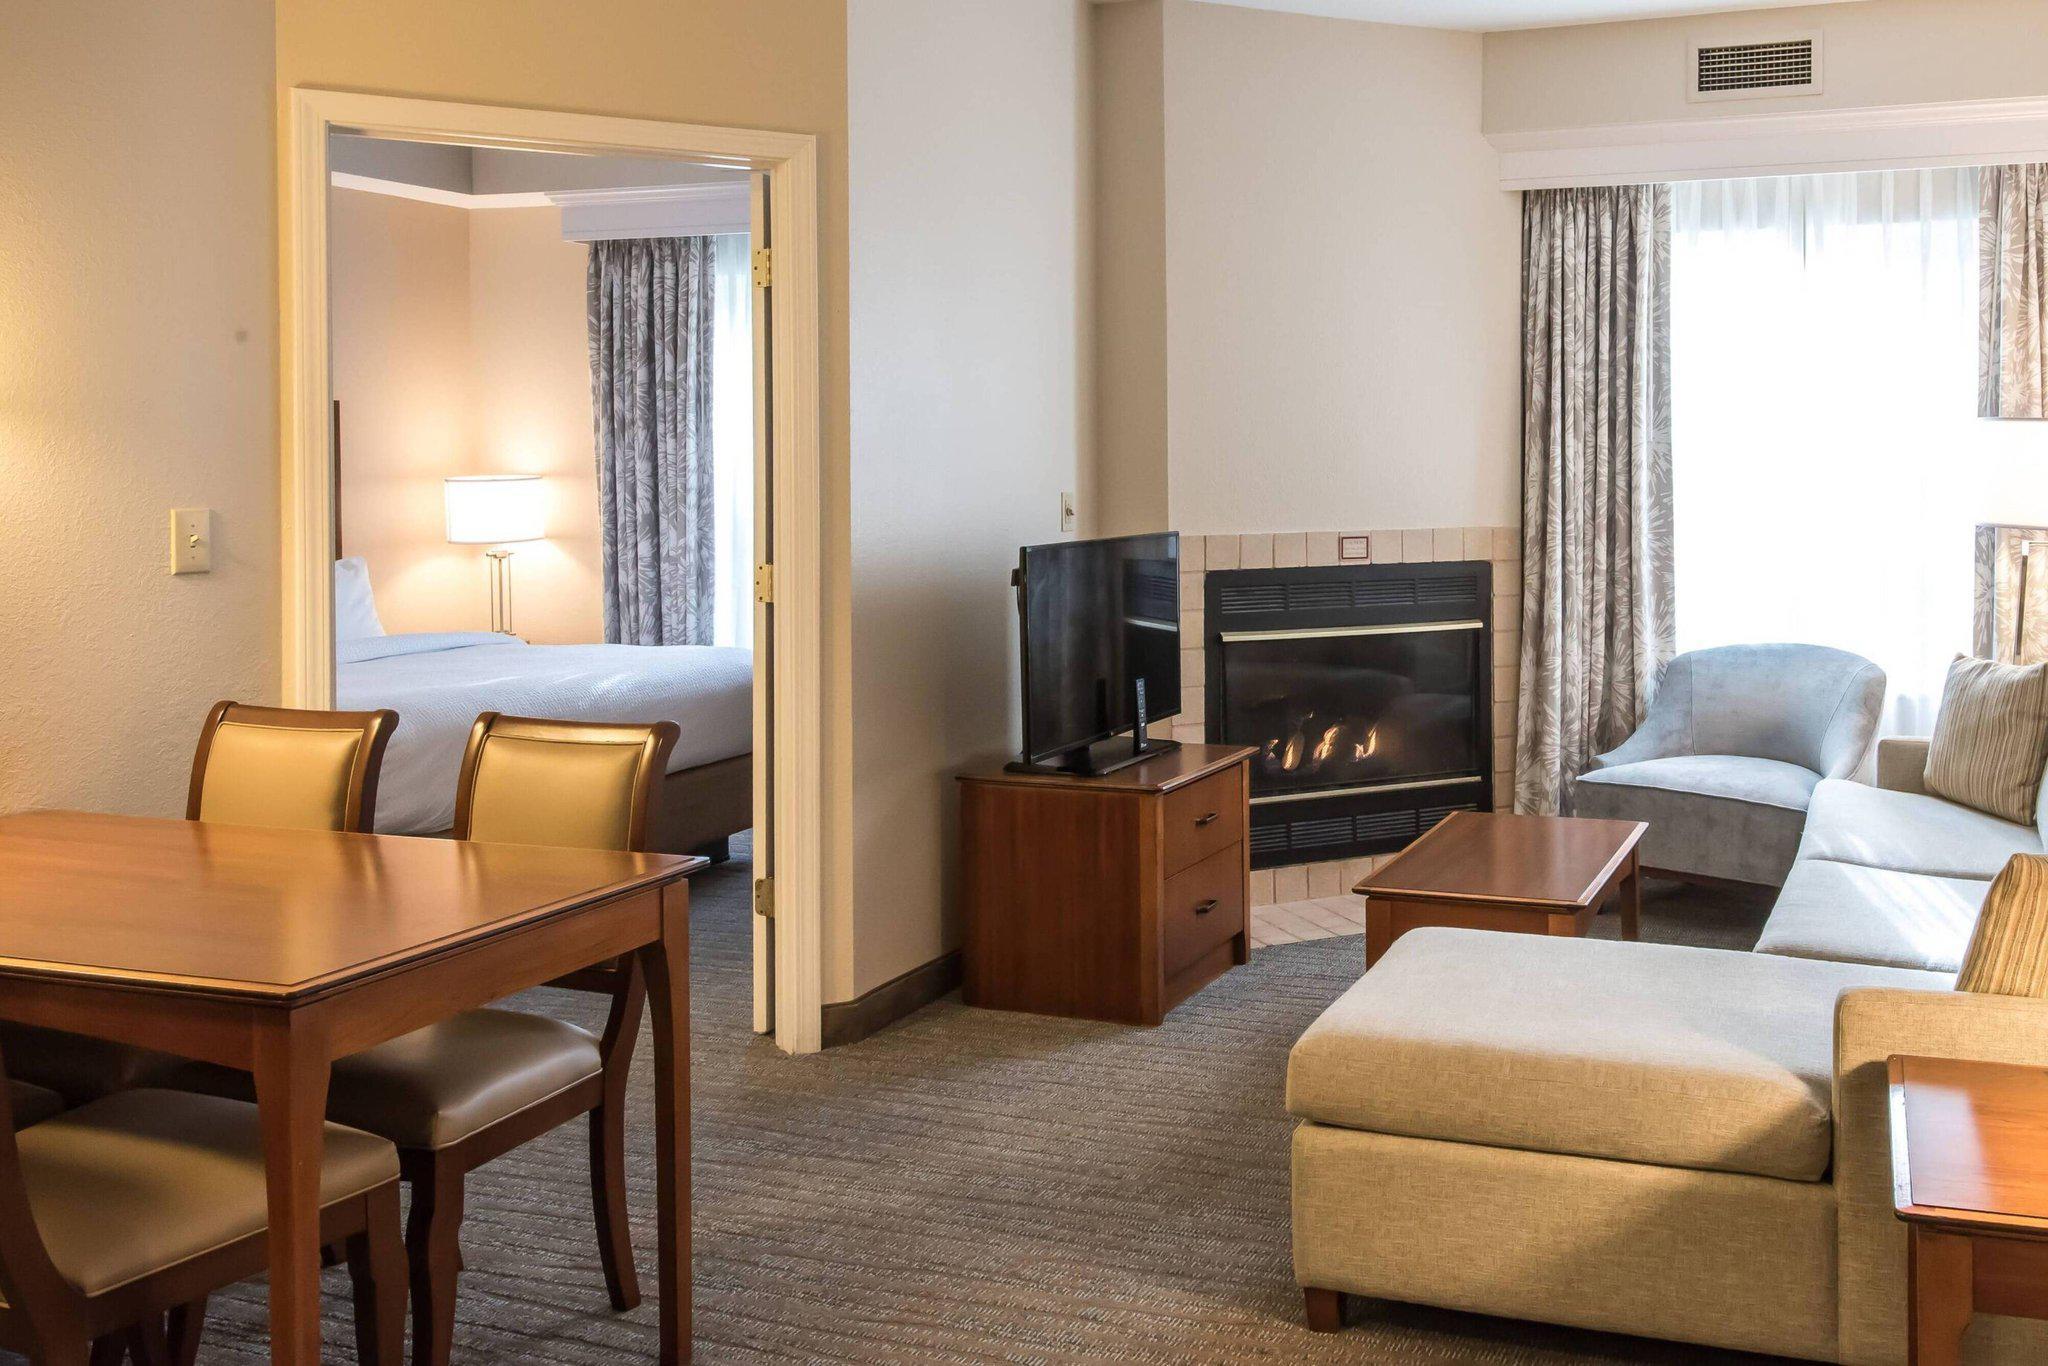 Residence Inn by Marriott Charleston Mt. Pleasant